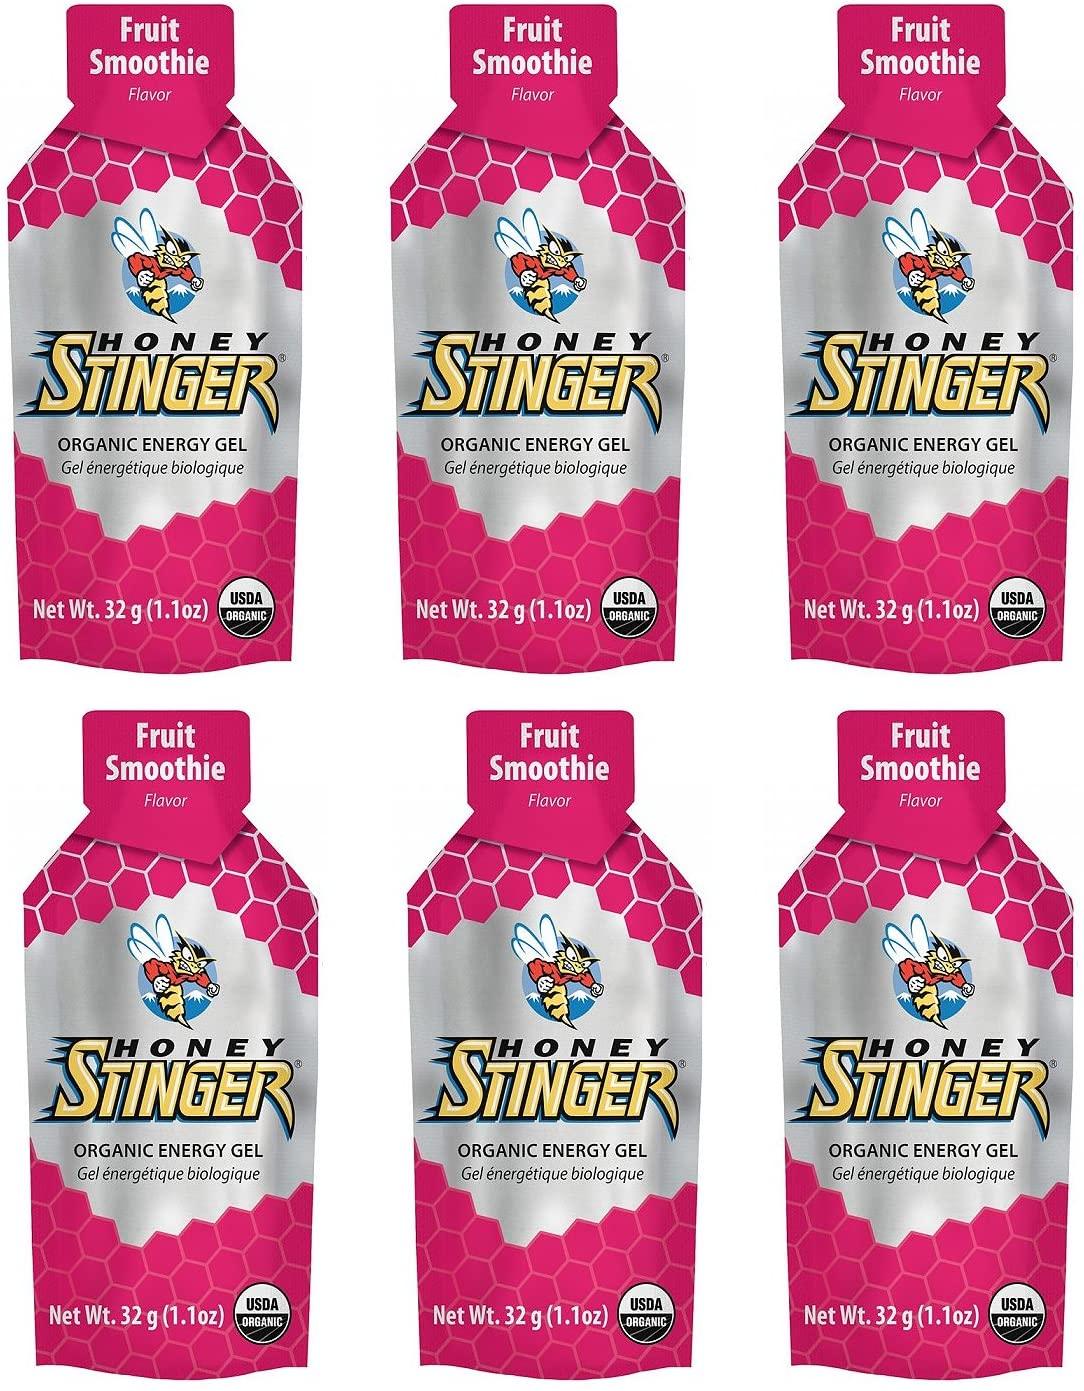 Honey Stinger Organic Energy Gel - Fruit Smoothie (6 x 1.1oz Packs)